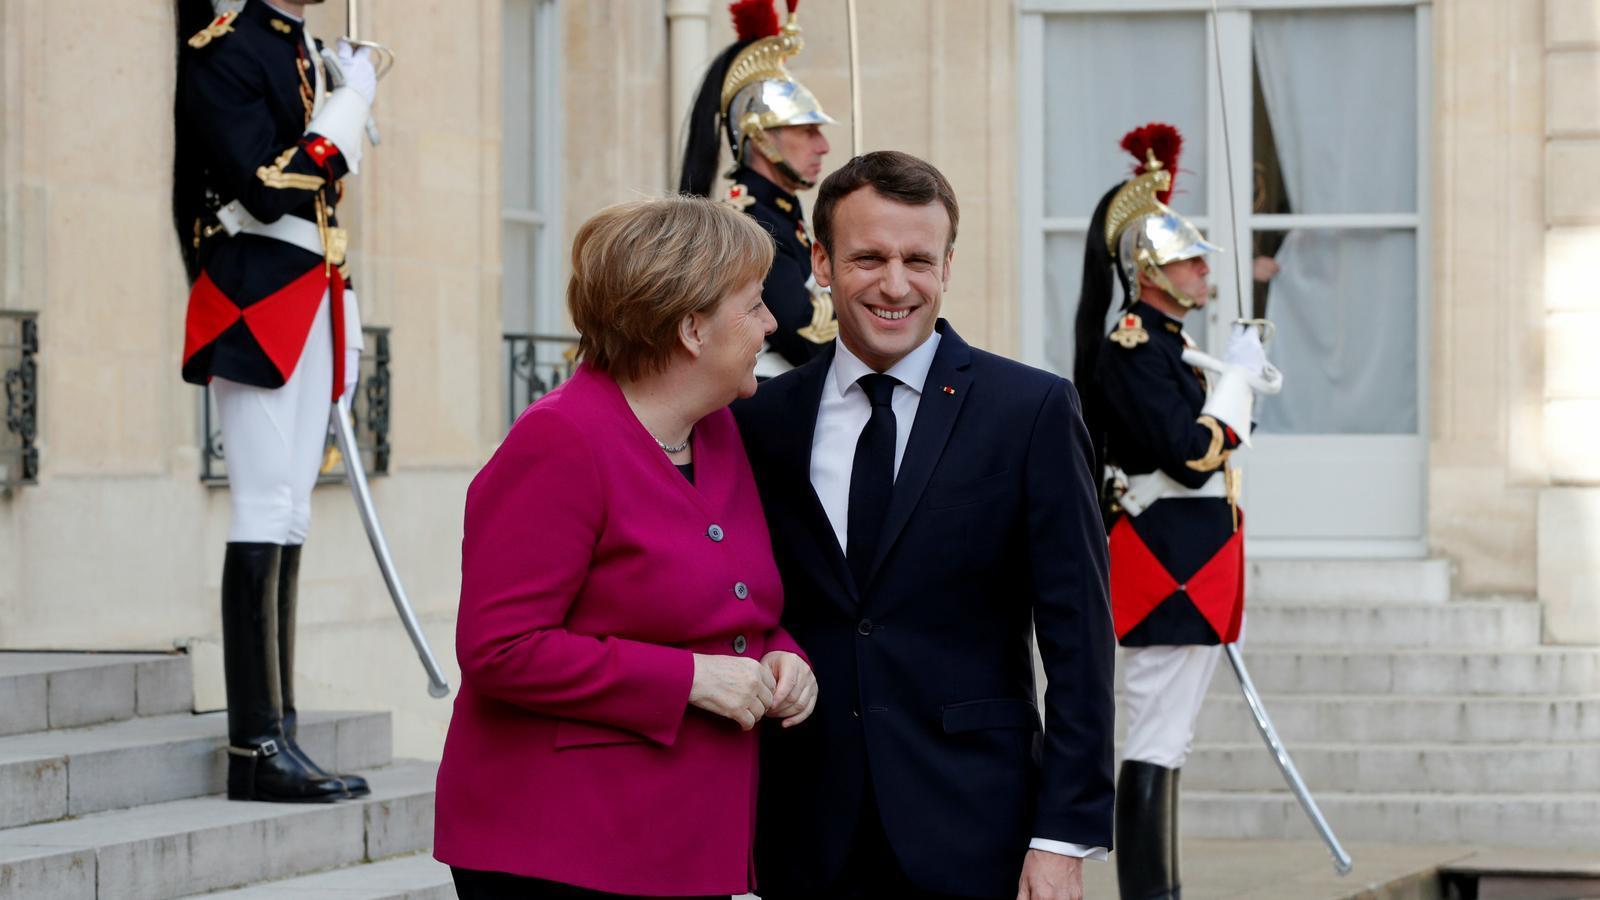 Macron i Merkel somriuen en una trobada al Palau de l'Elisi de París / PHILIPPE WOJAZER / REUTERS